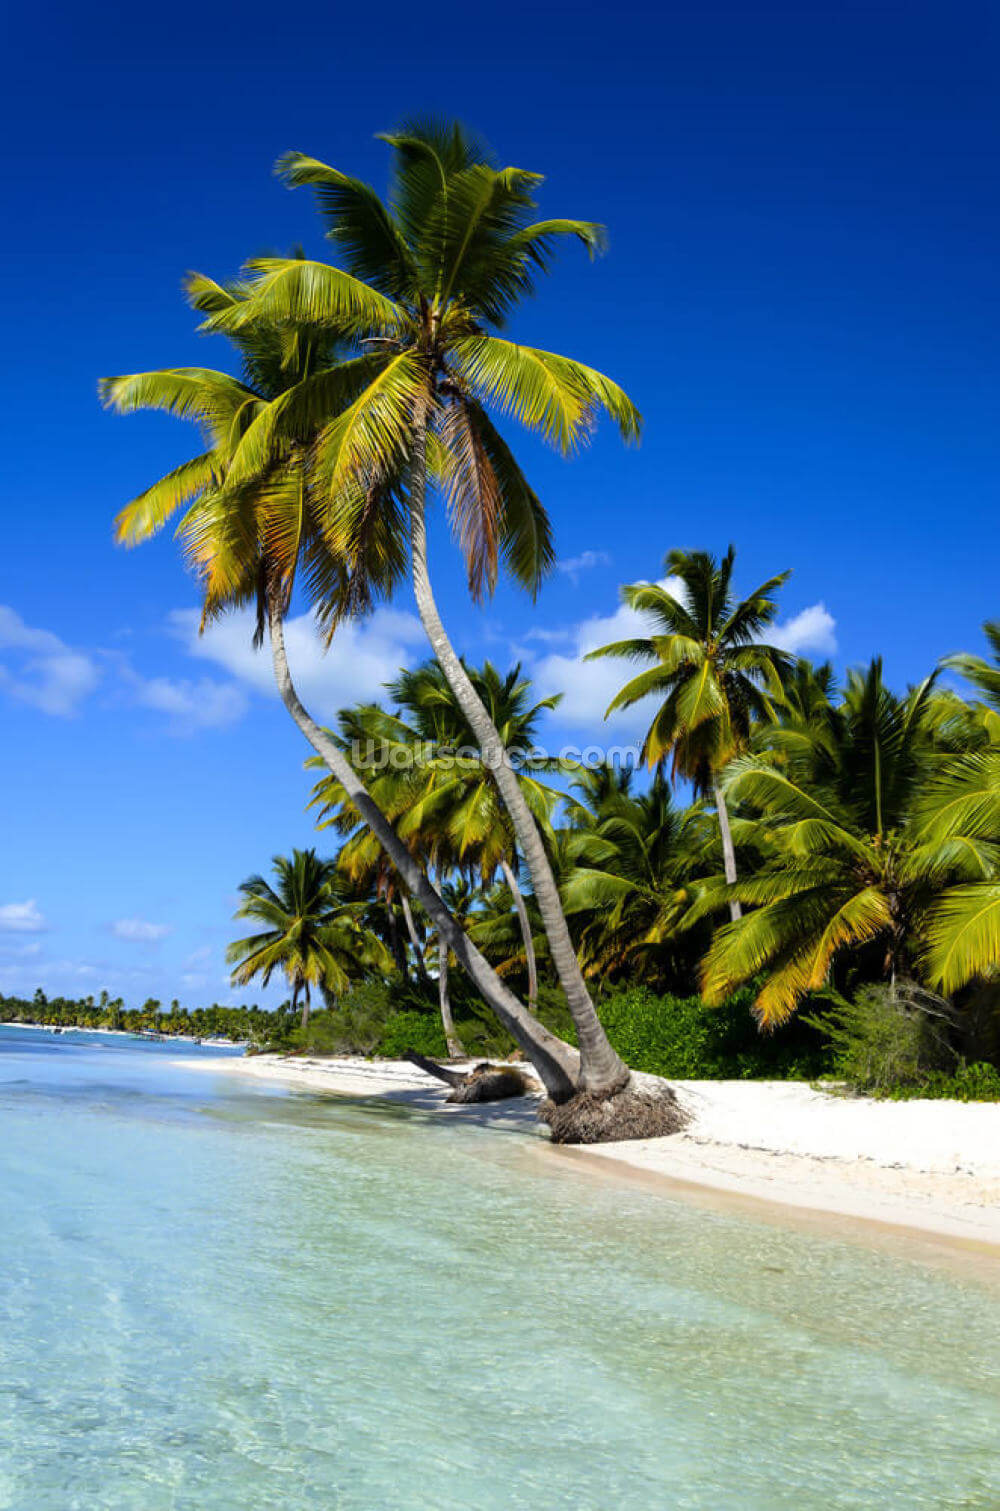 Beach Palm Leaf Wallpaper Image Nuwallpaper Hd